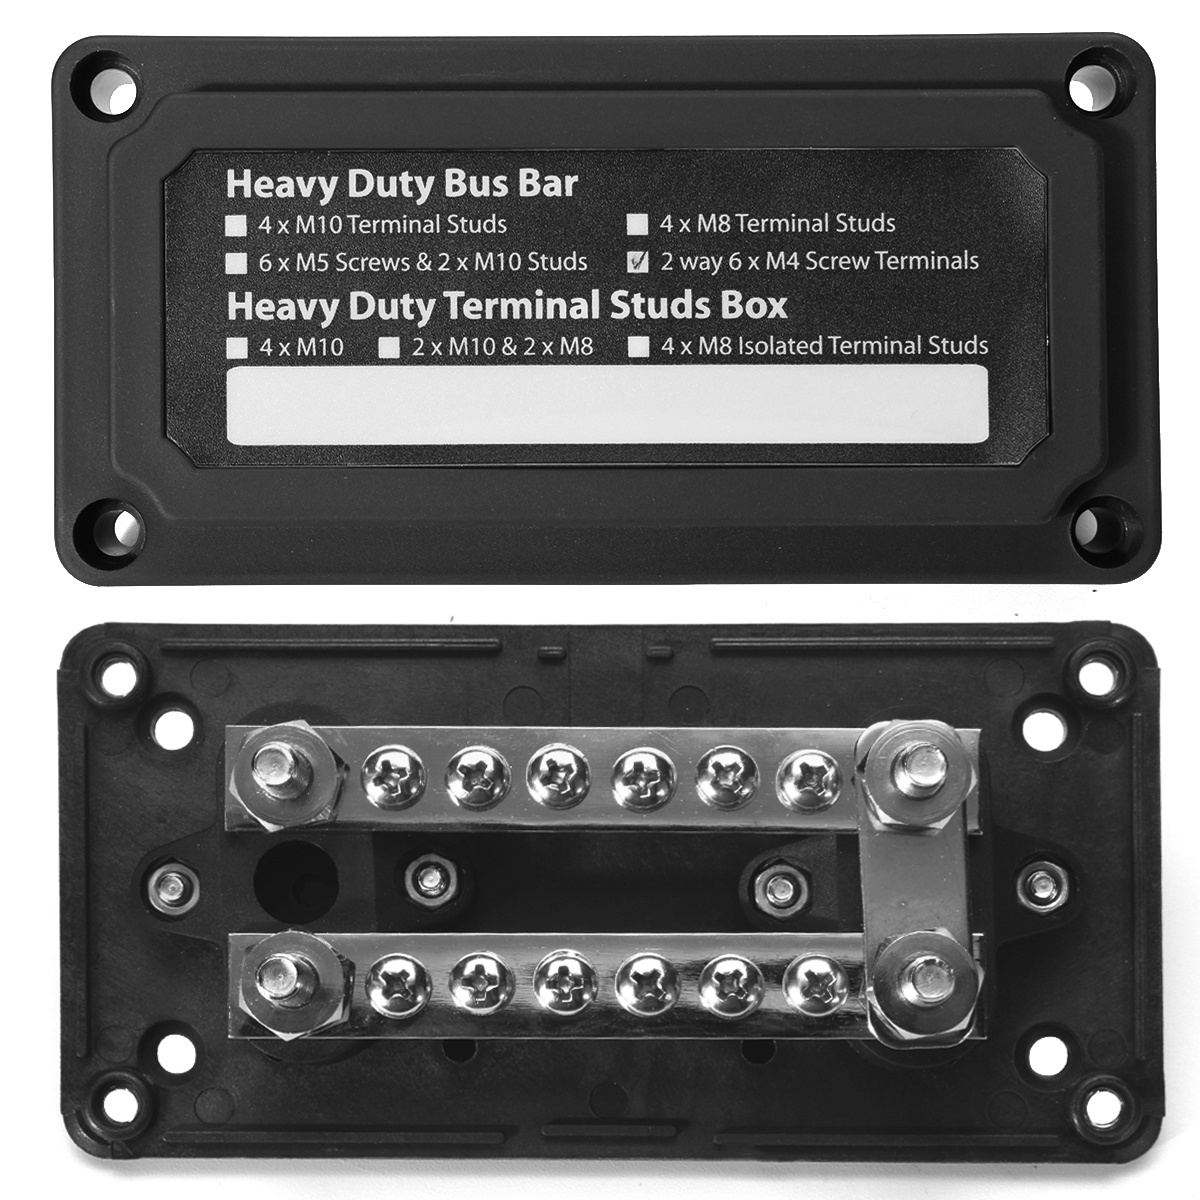 buss fuse box connectors wiring diagram used automotive fuse box diy [ 1200 x 1200 Pixel ]